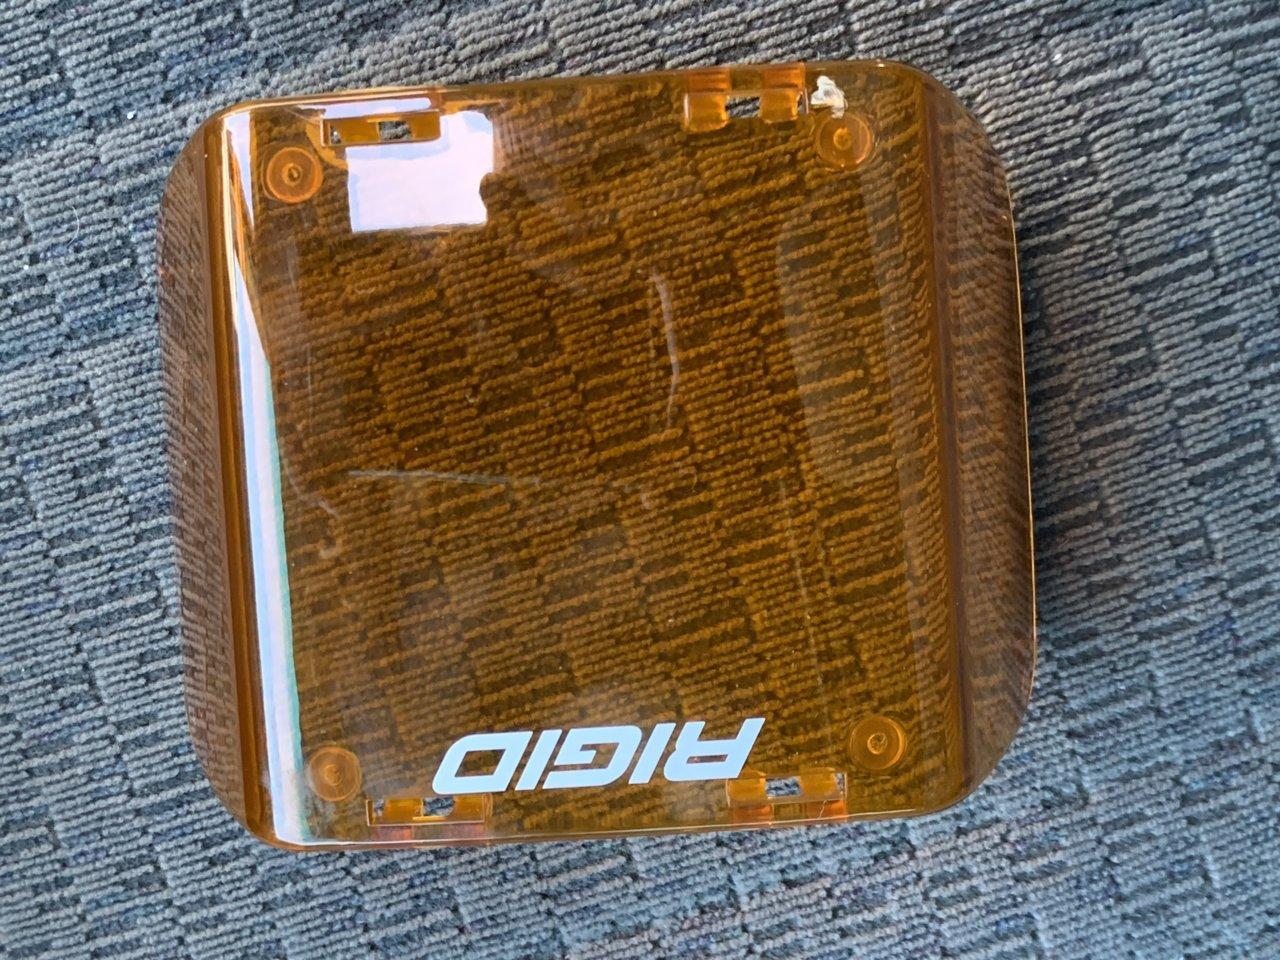 6193598B-BEE3-4CEC-BF56-D5D759FA0B9E.jpg